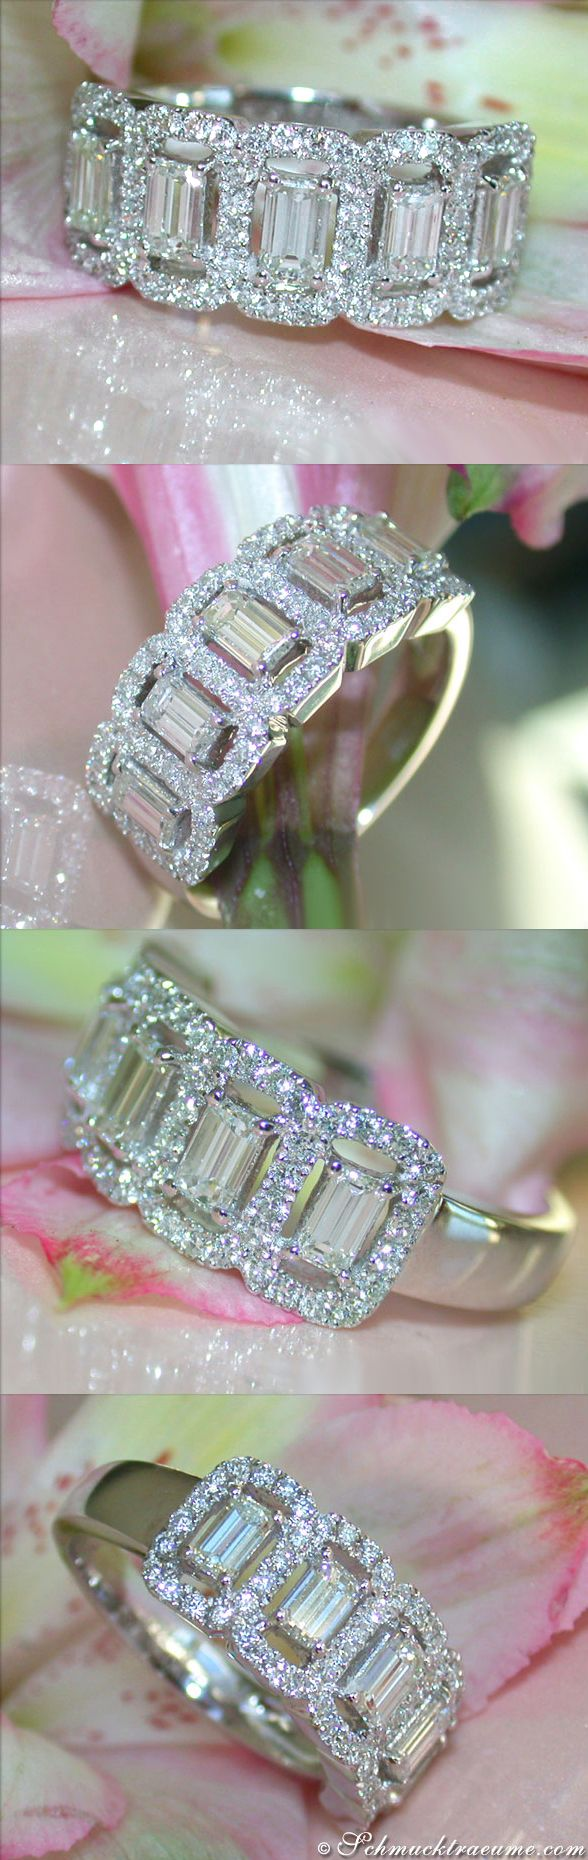 Picture Perfect Diamond Band   1.40 ct. G VS/VVS   Whitegold 18k - schmucktraeume.com Like: https://www.facebook.com/Noble-Juwelen-150871984924926/